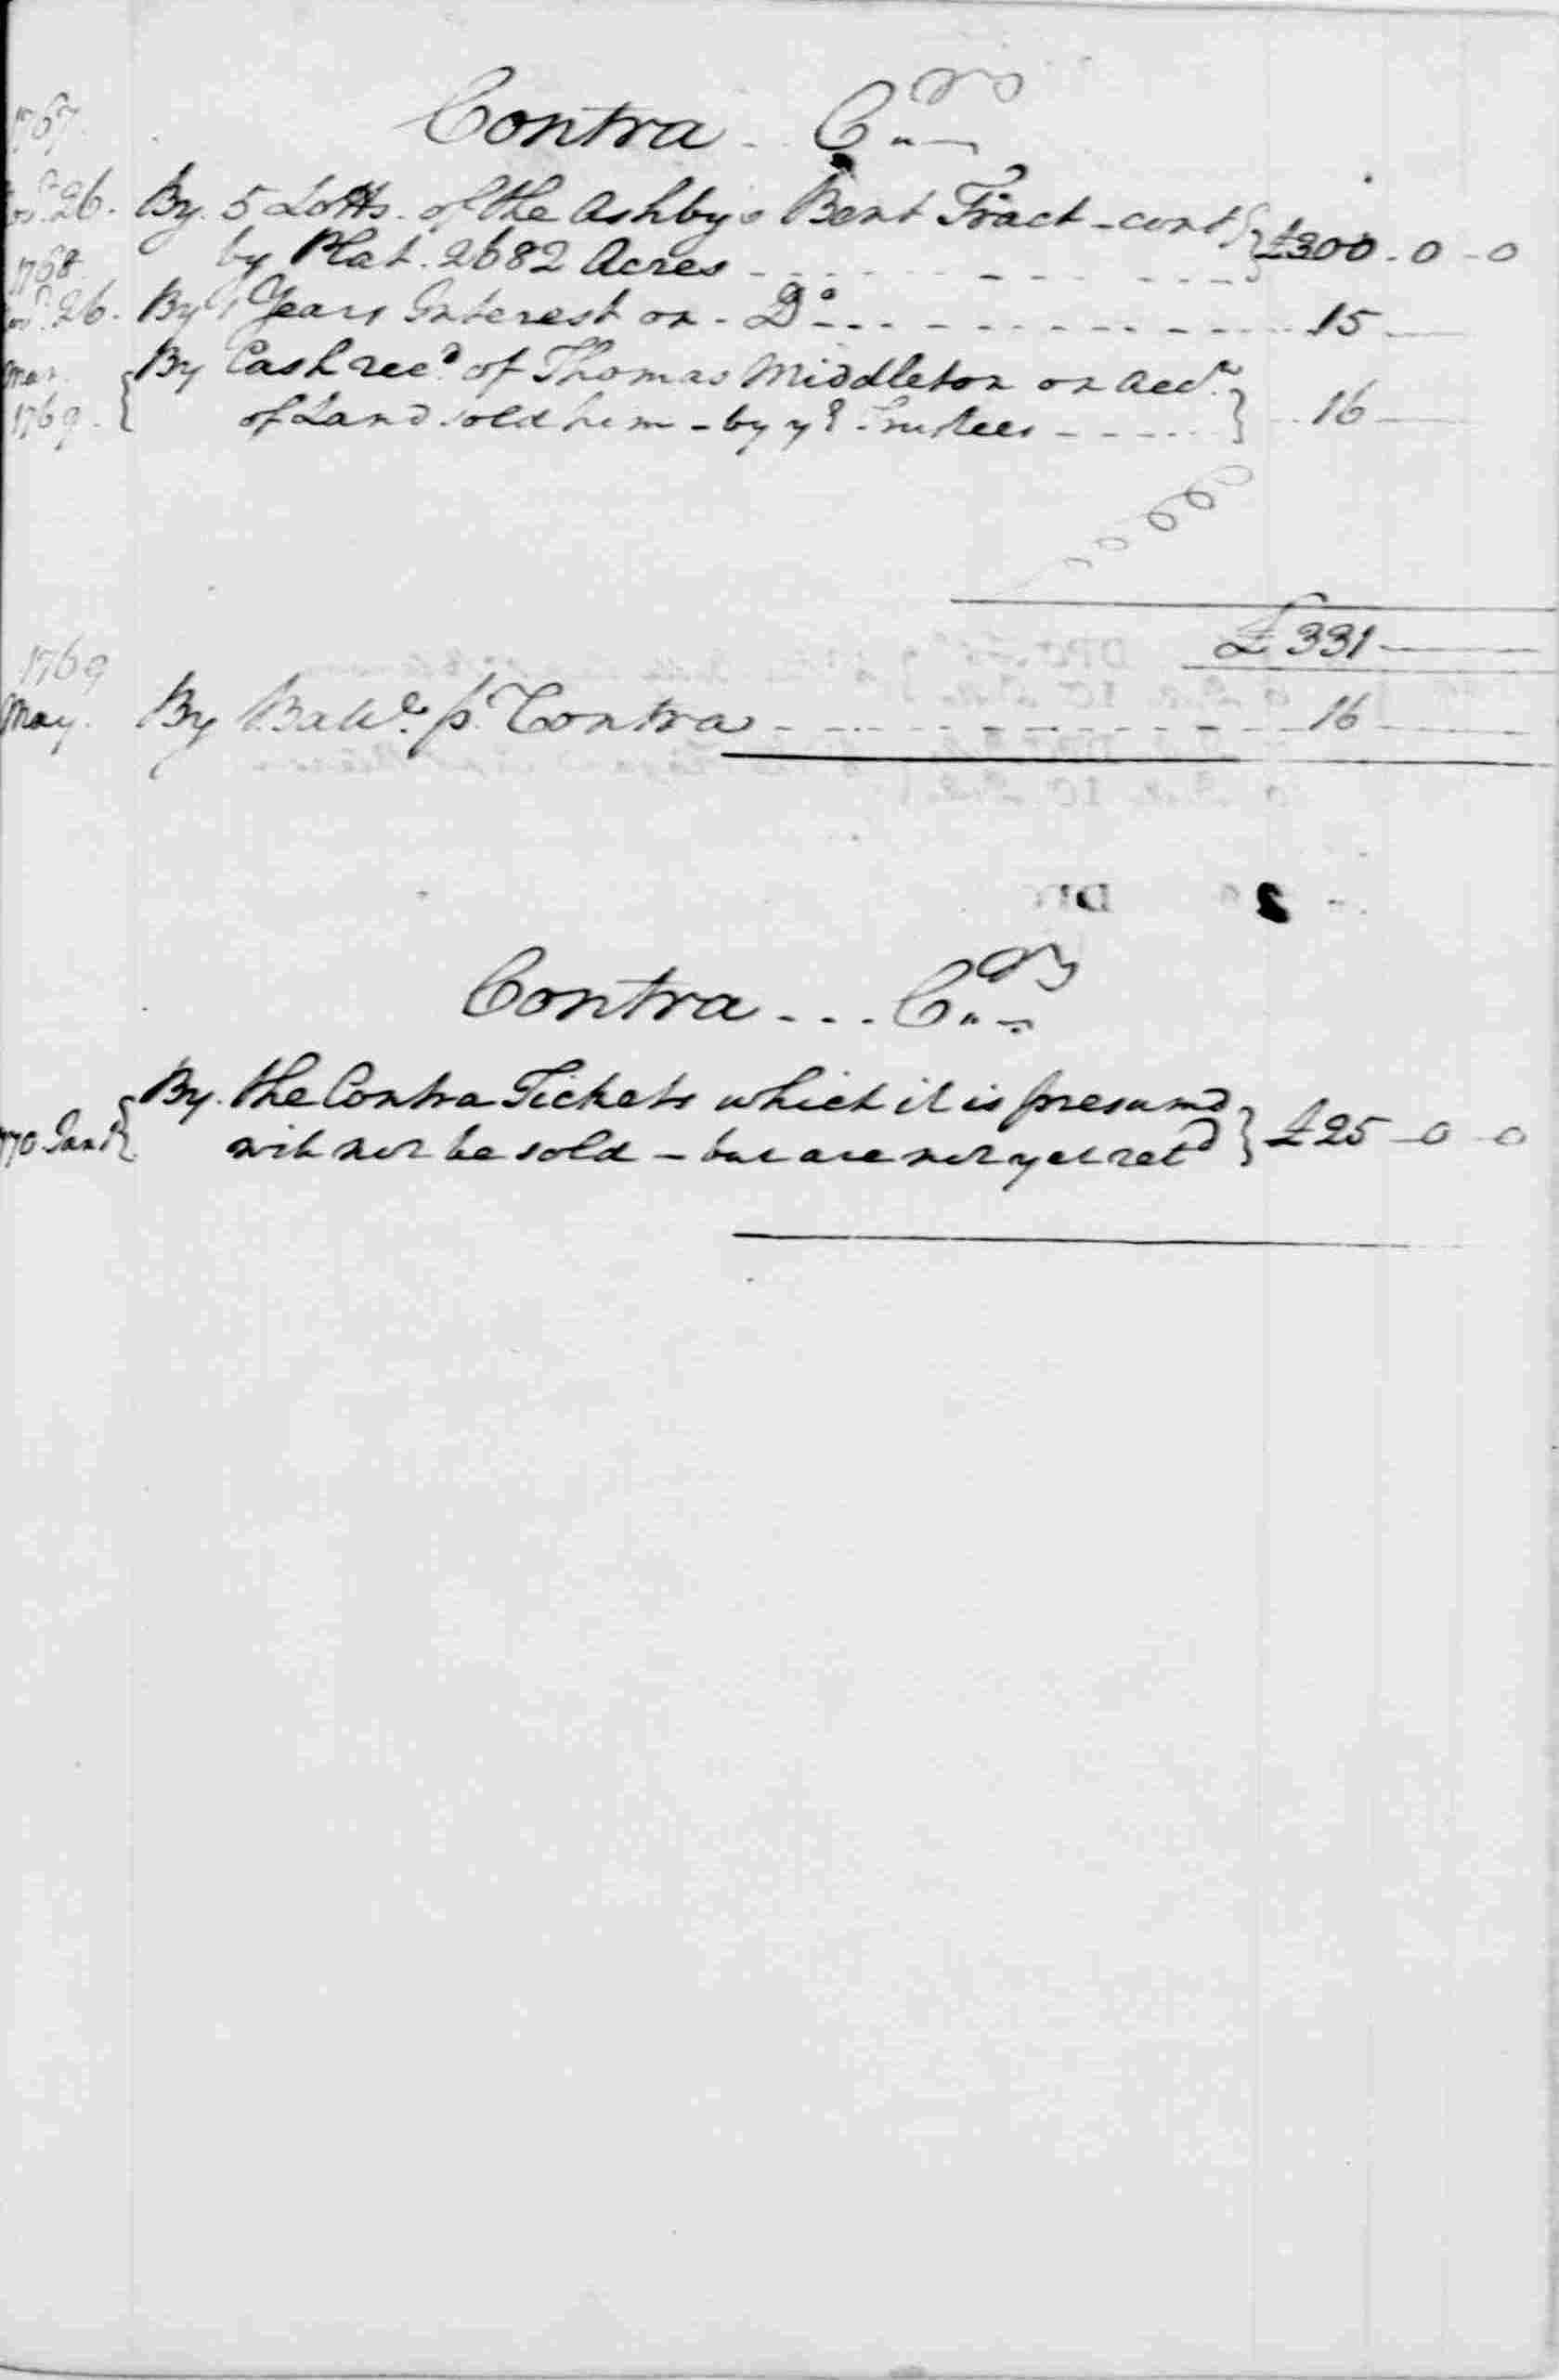 Ledger A, folio 238, right side